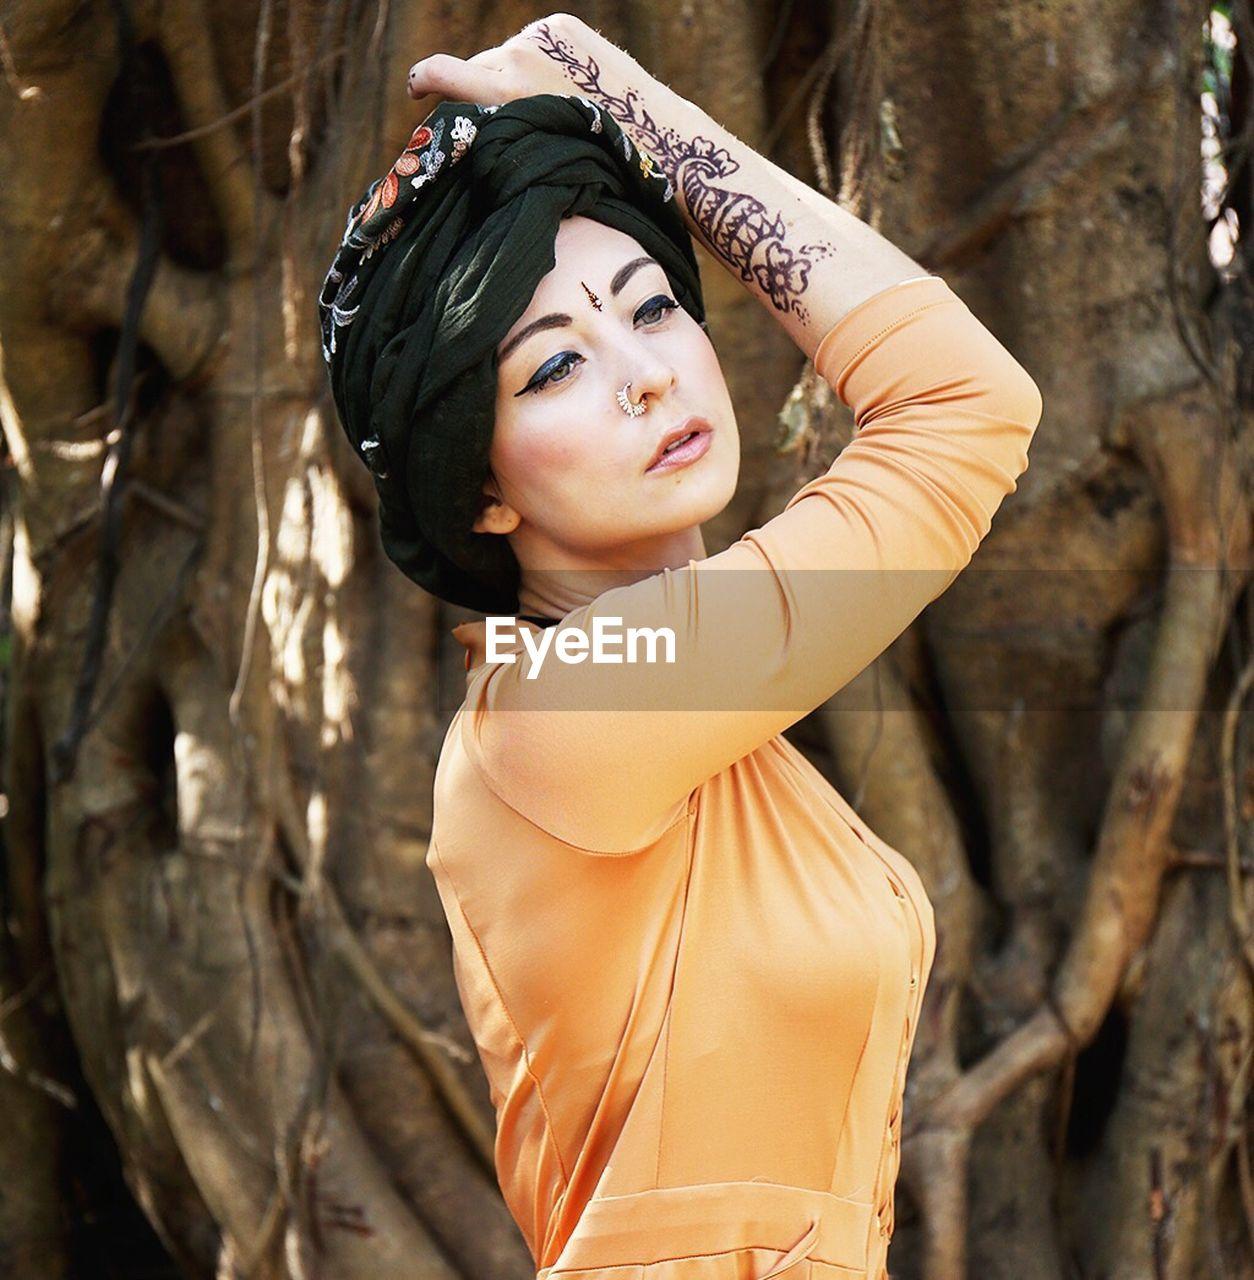 Beautiful fashion model posing against tree trunk